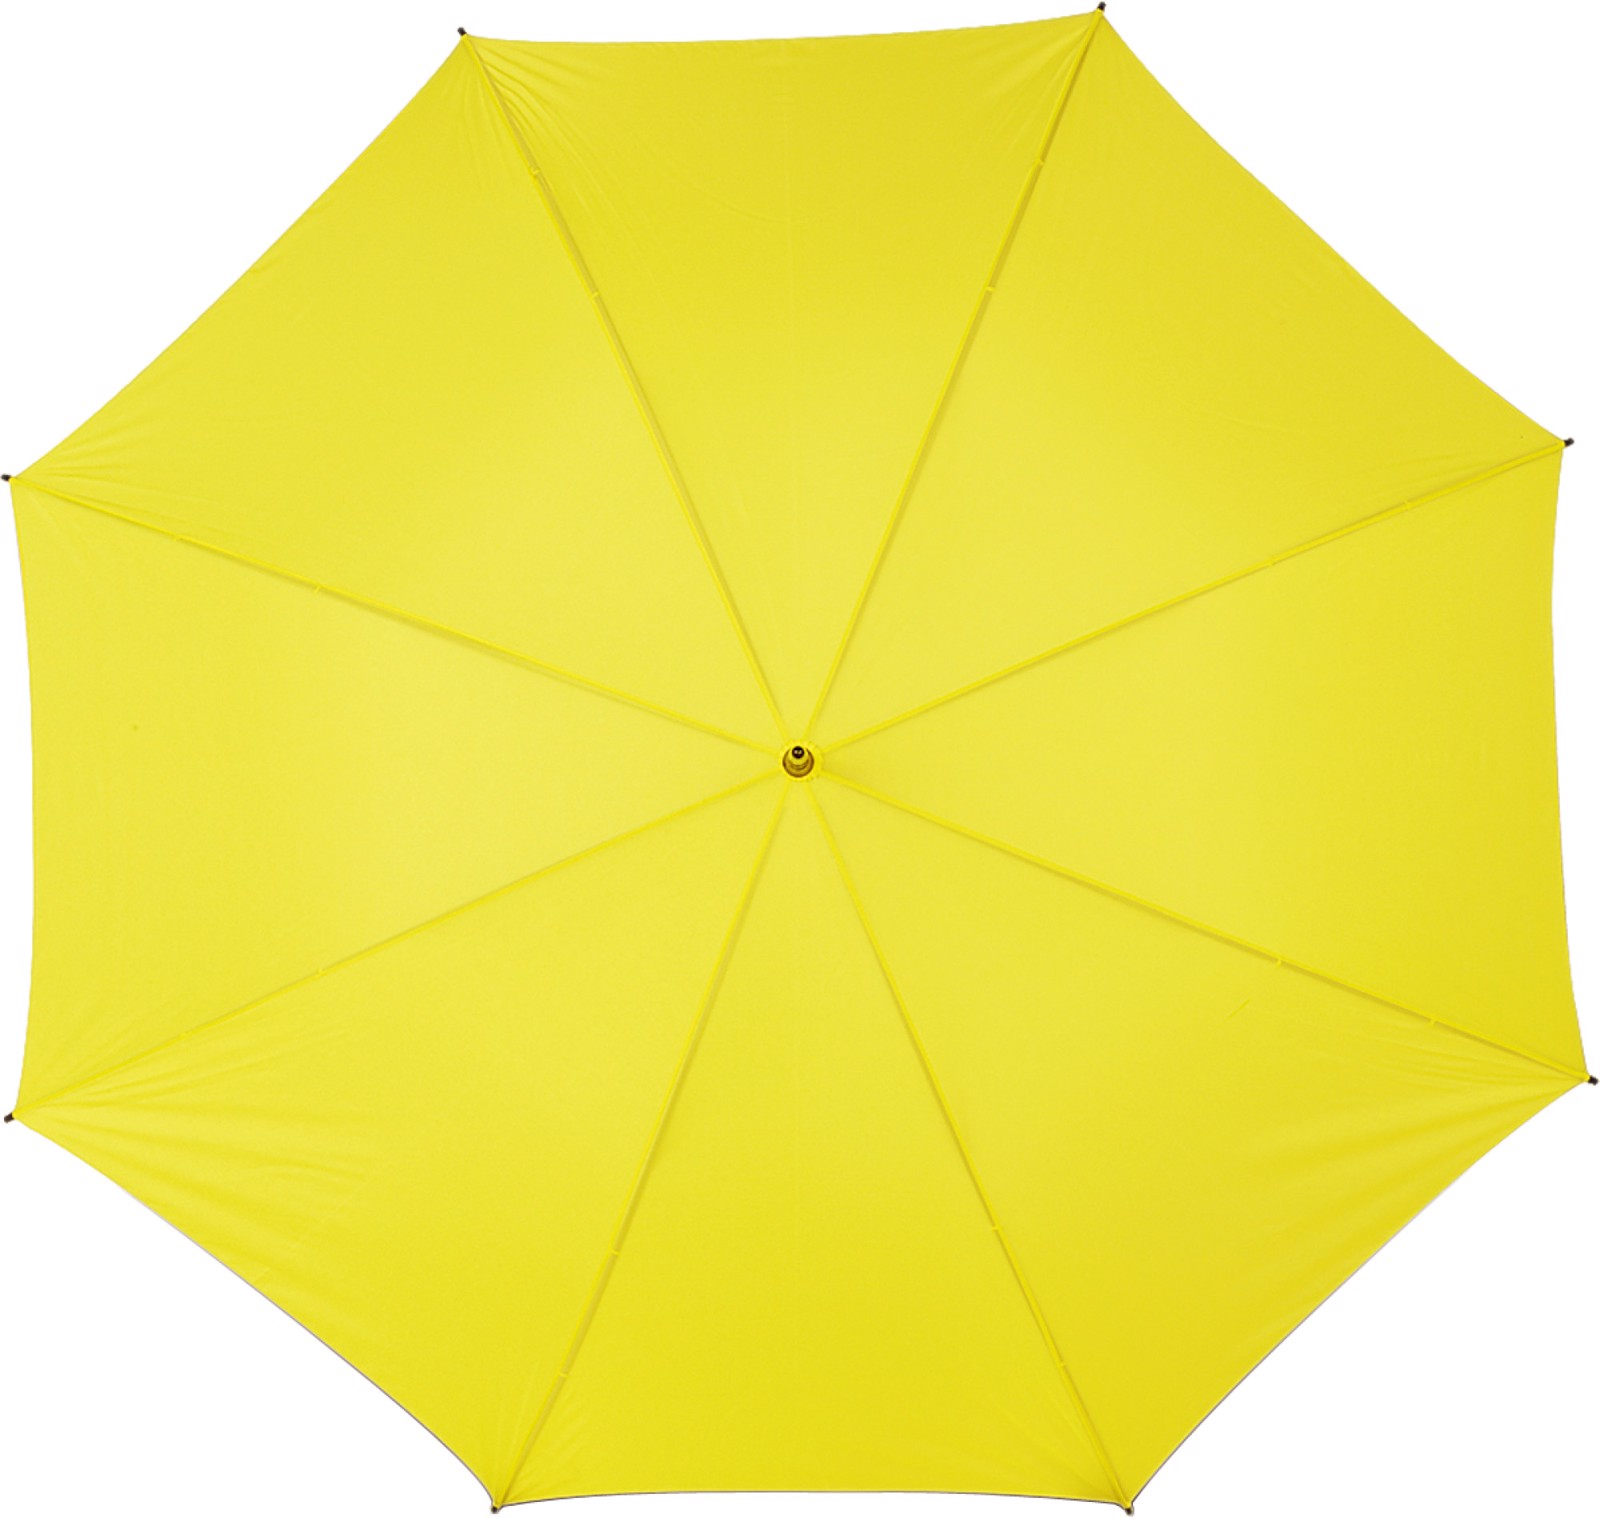 Polyester (210T) umbrella - Yellow